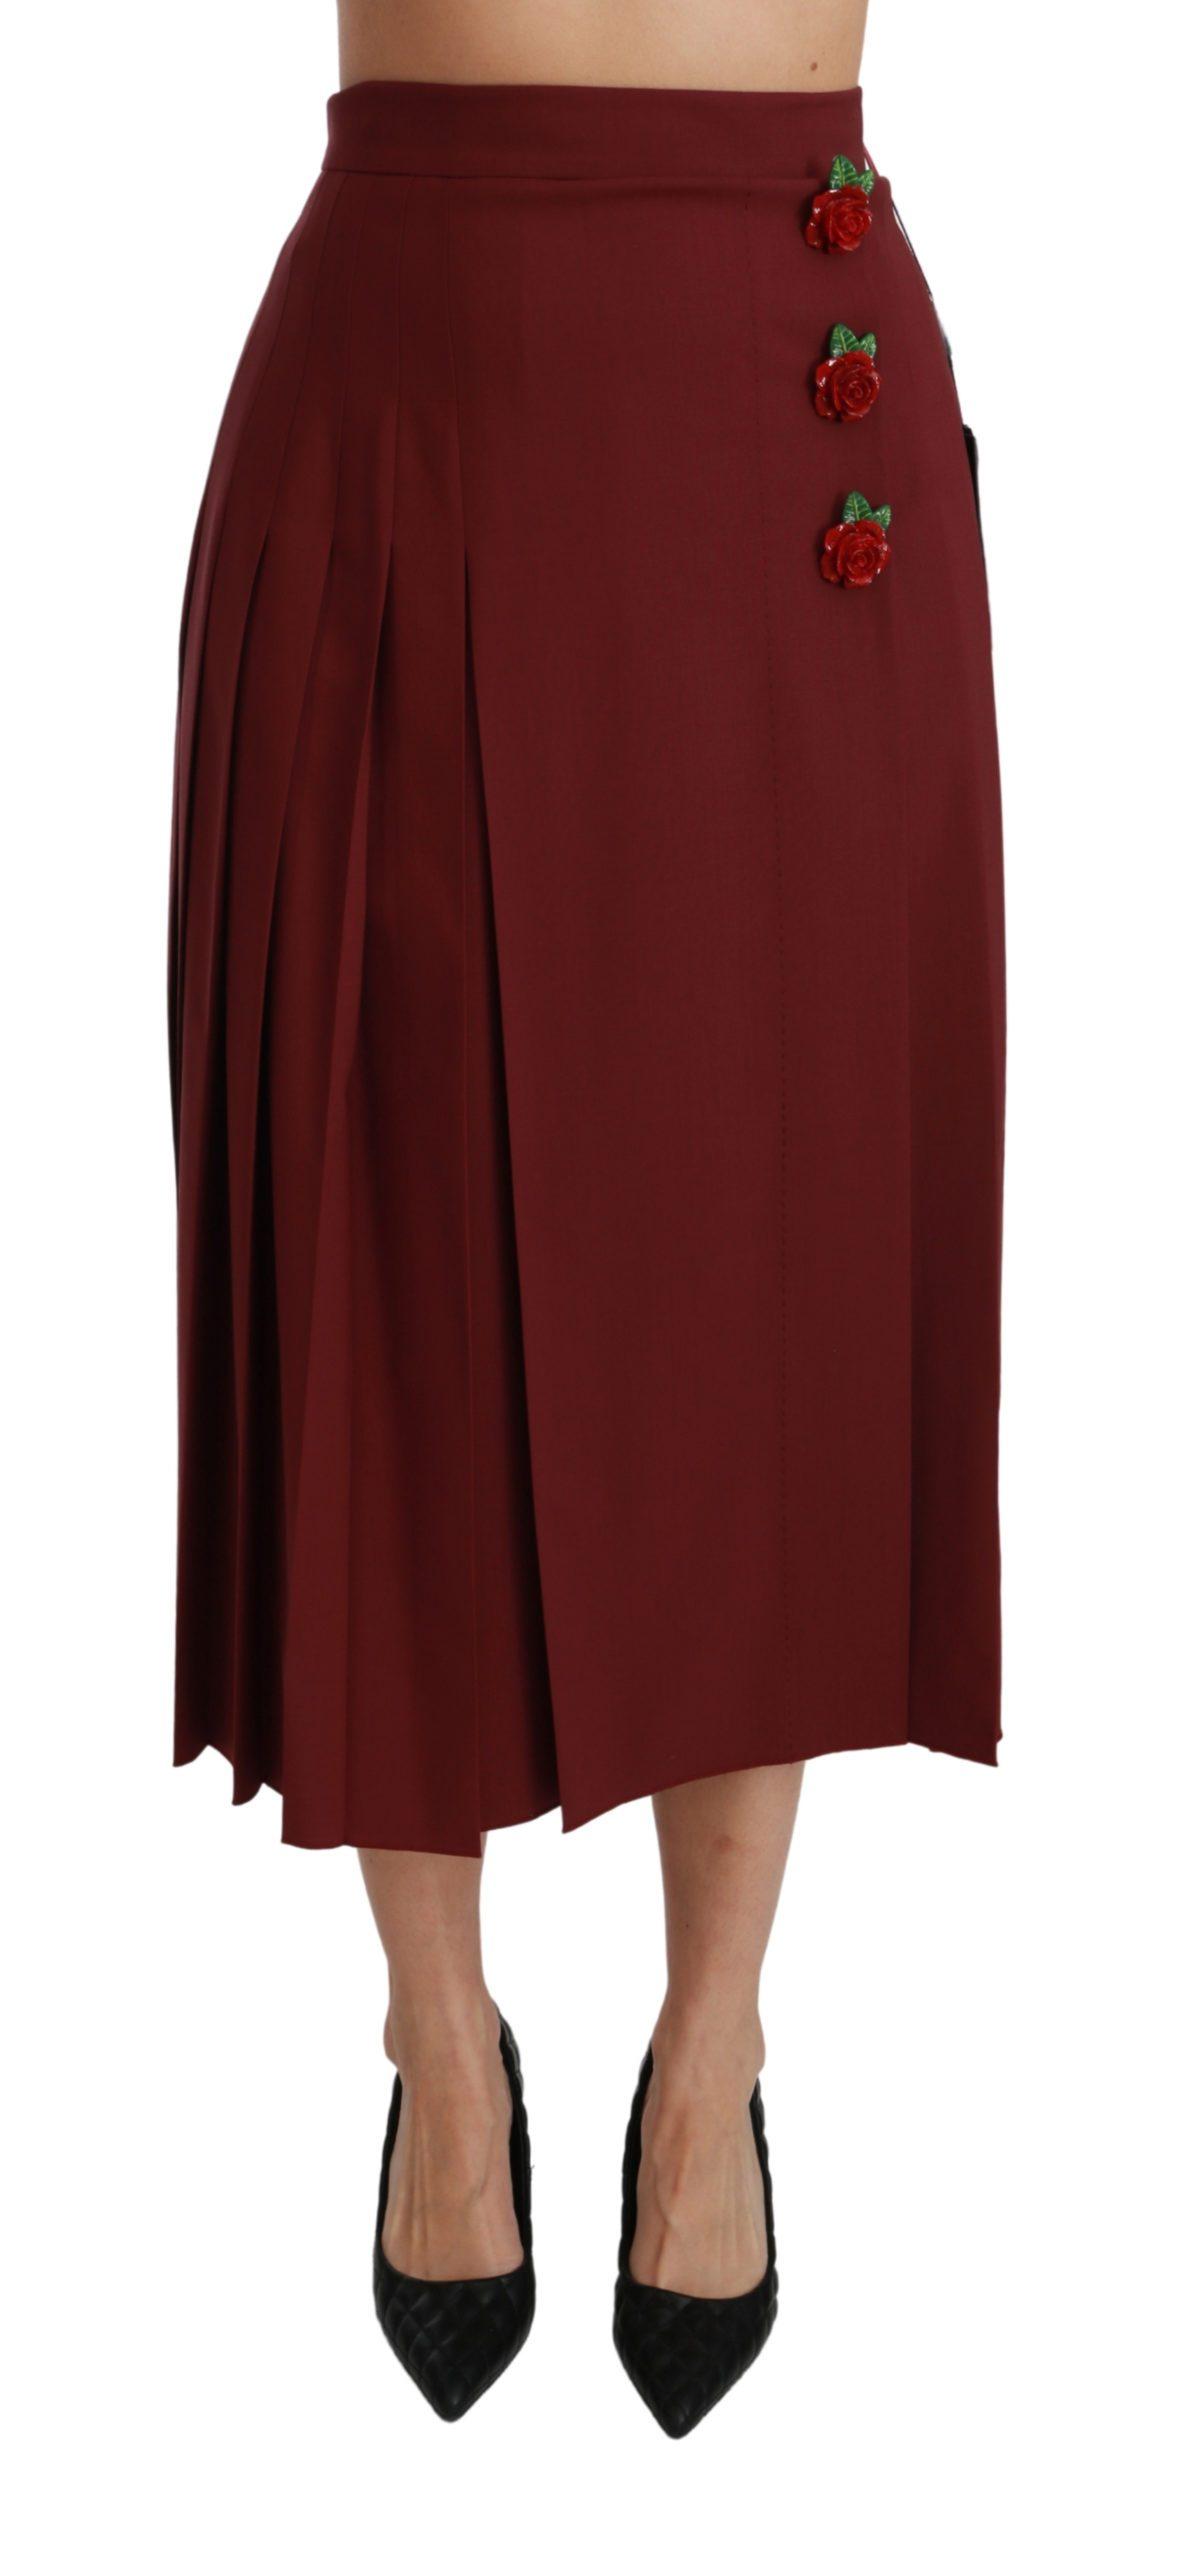 Dolce & Gabbana Women's High Waist Pleated Maxi Wool Skirt Red SKI1416 - IT38|XS